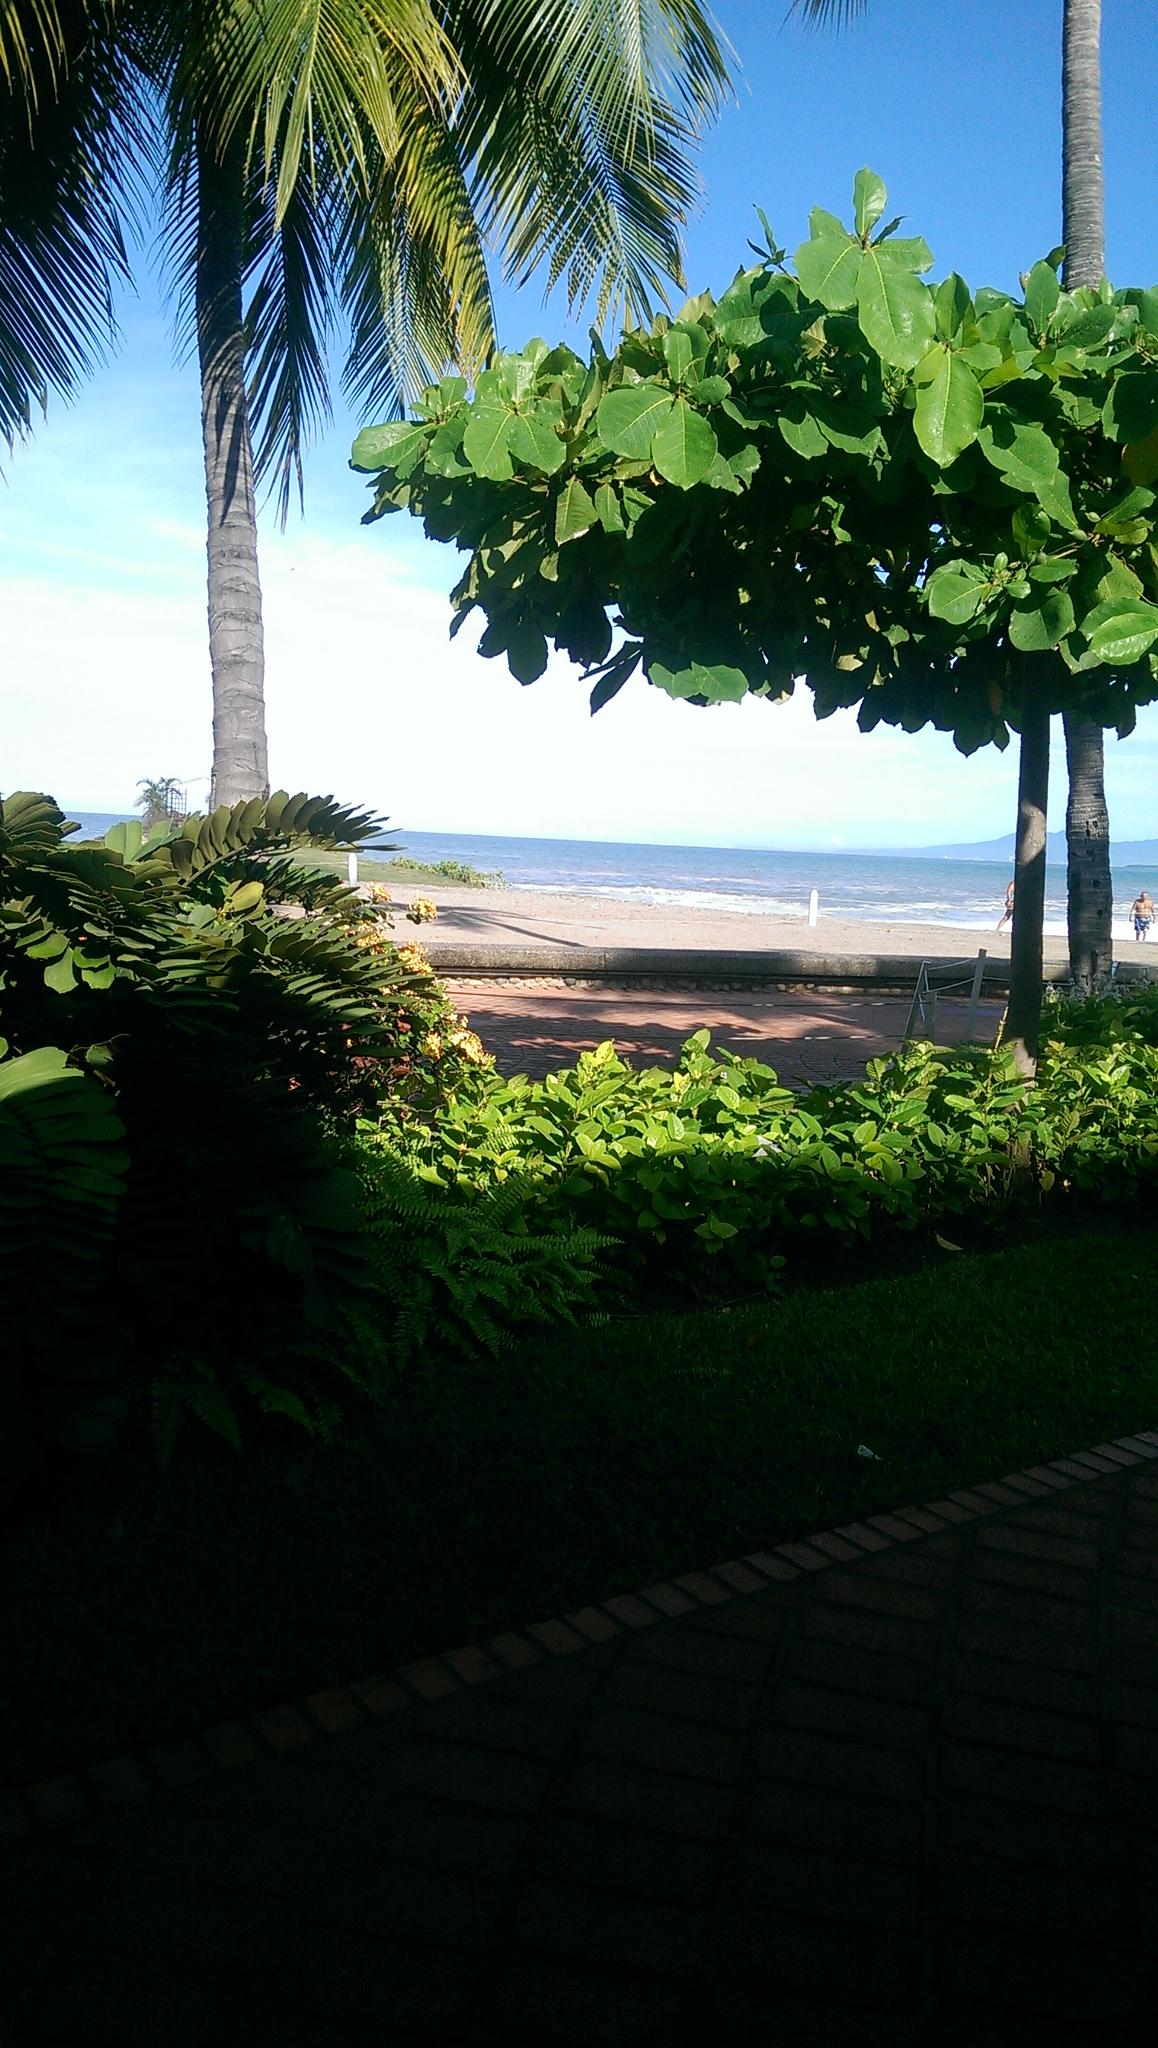 Puerto Vallarta Bougainvillea resort  by palo905